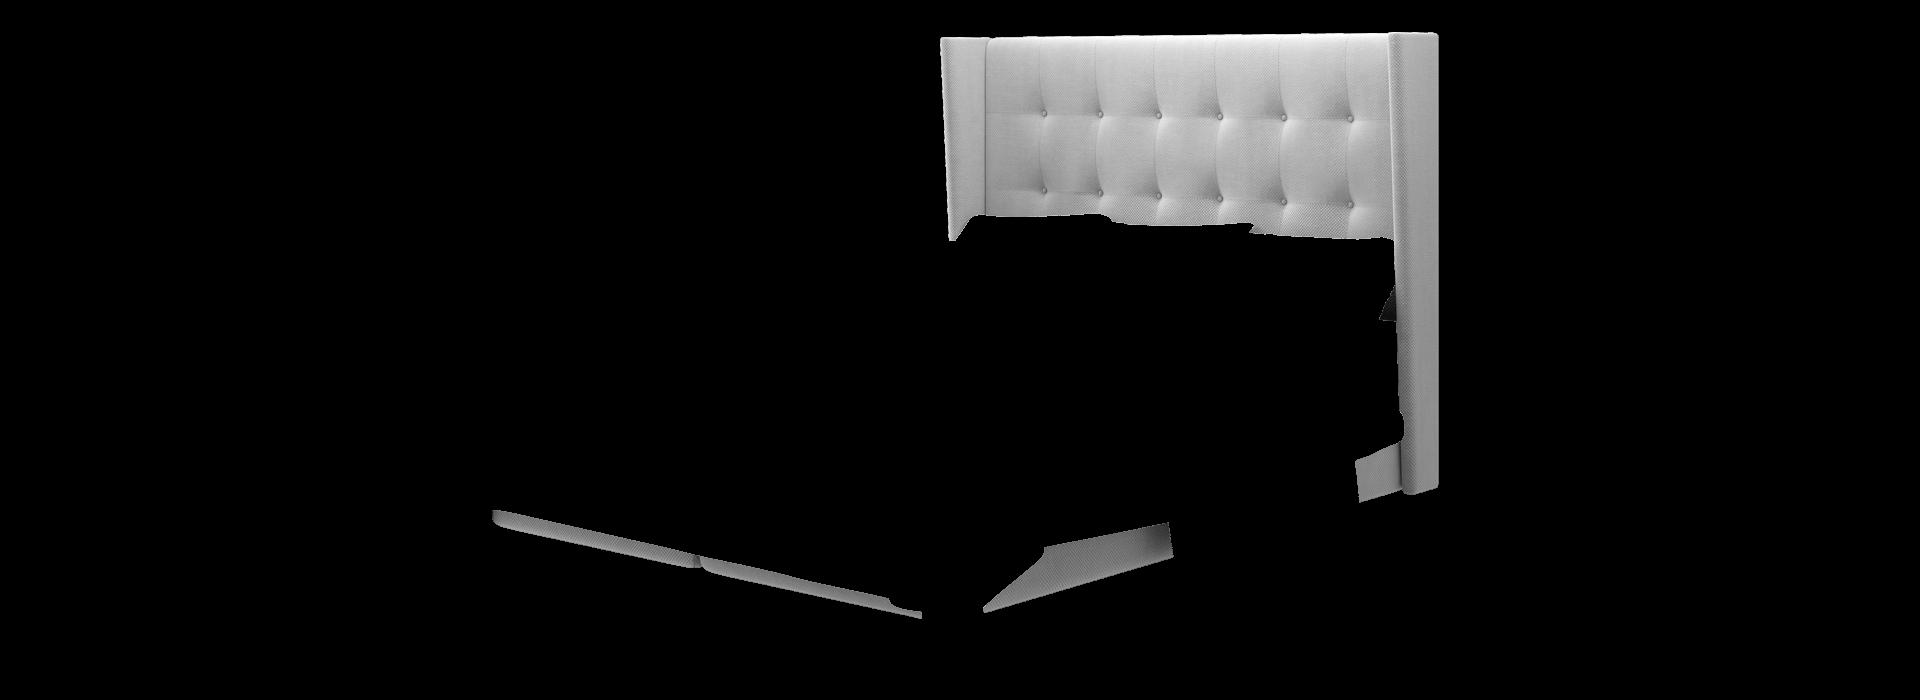 Грета 1.6 ліжко box spring - маска 2